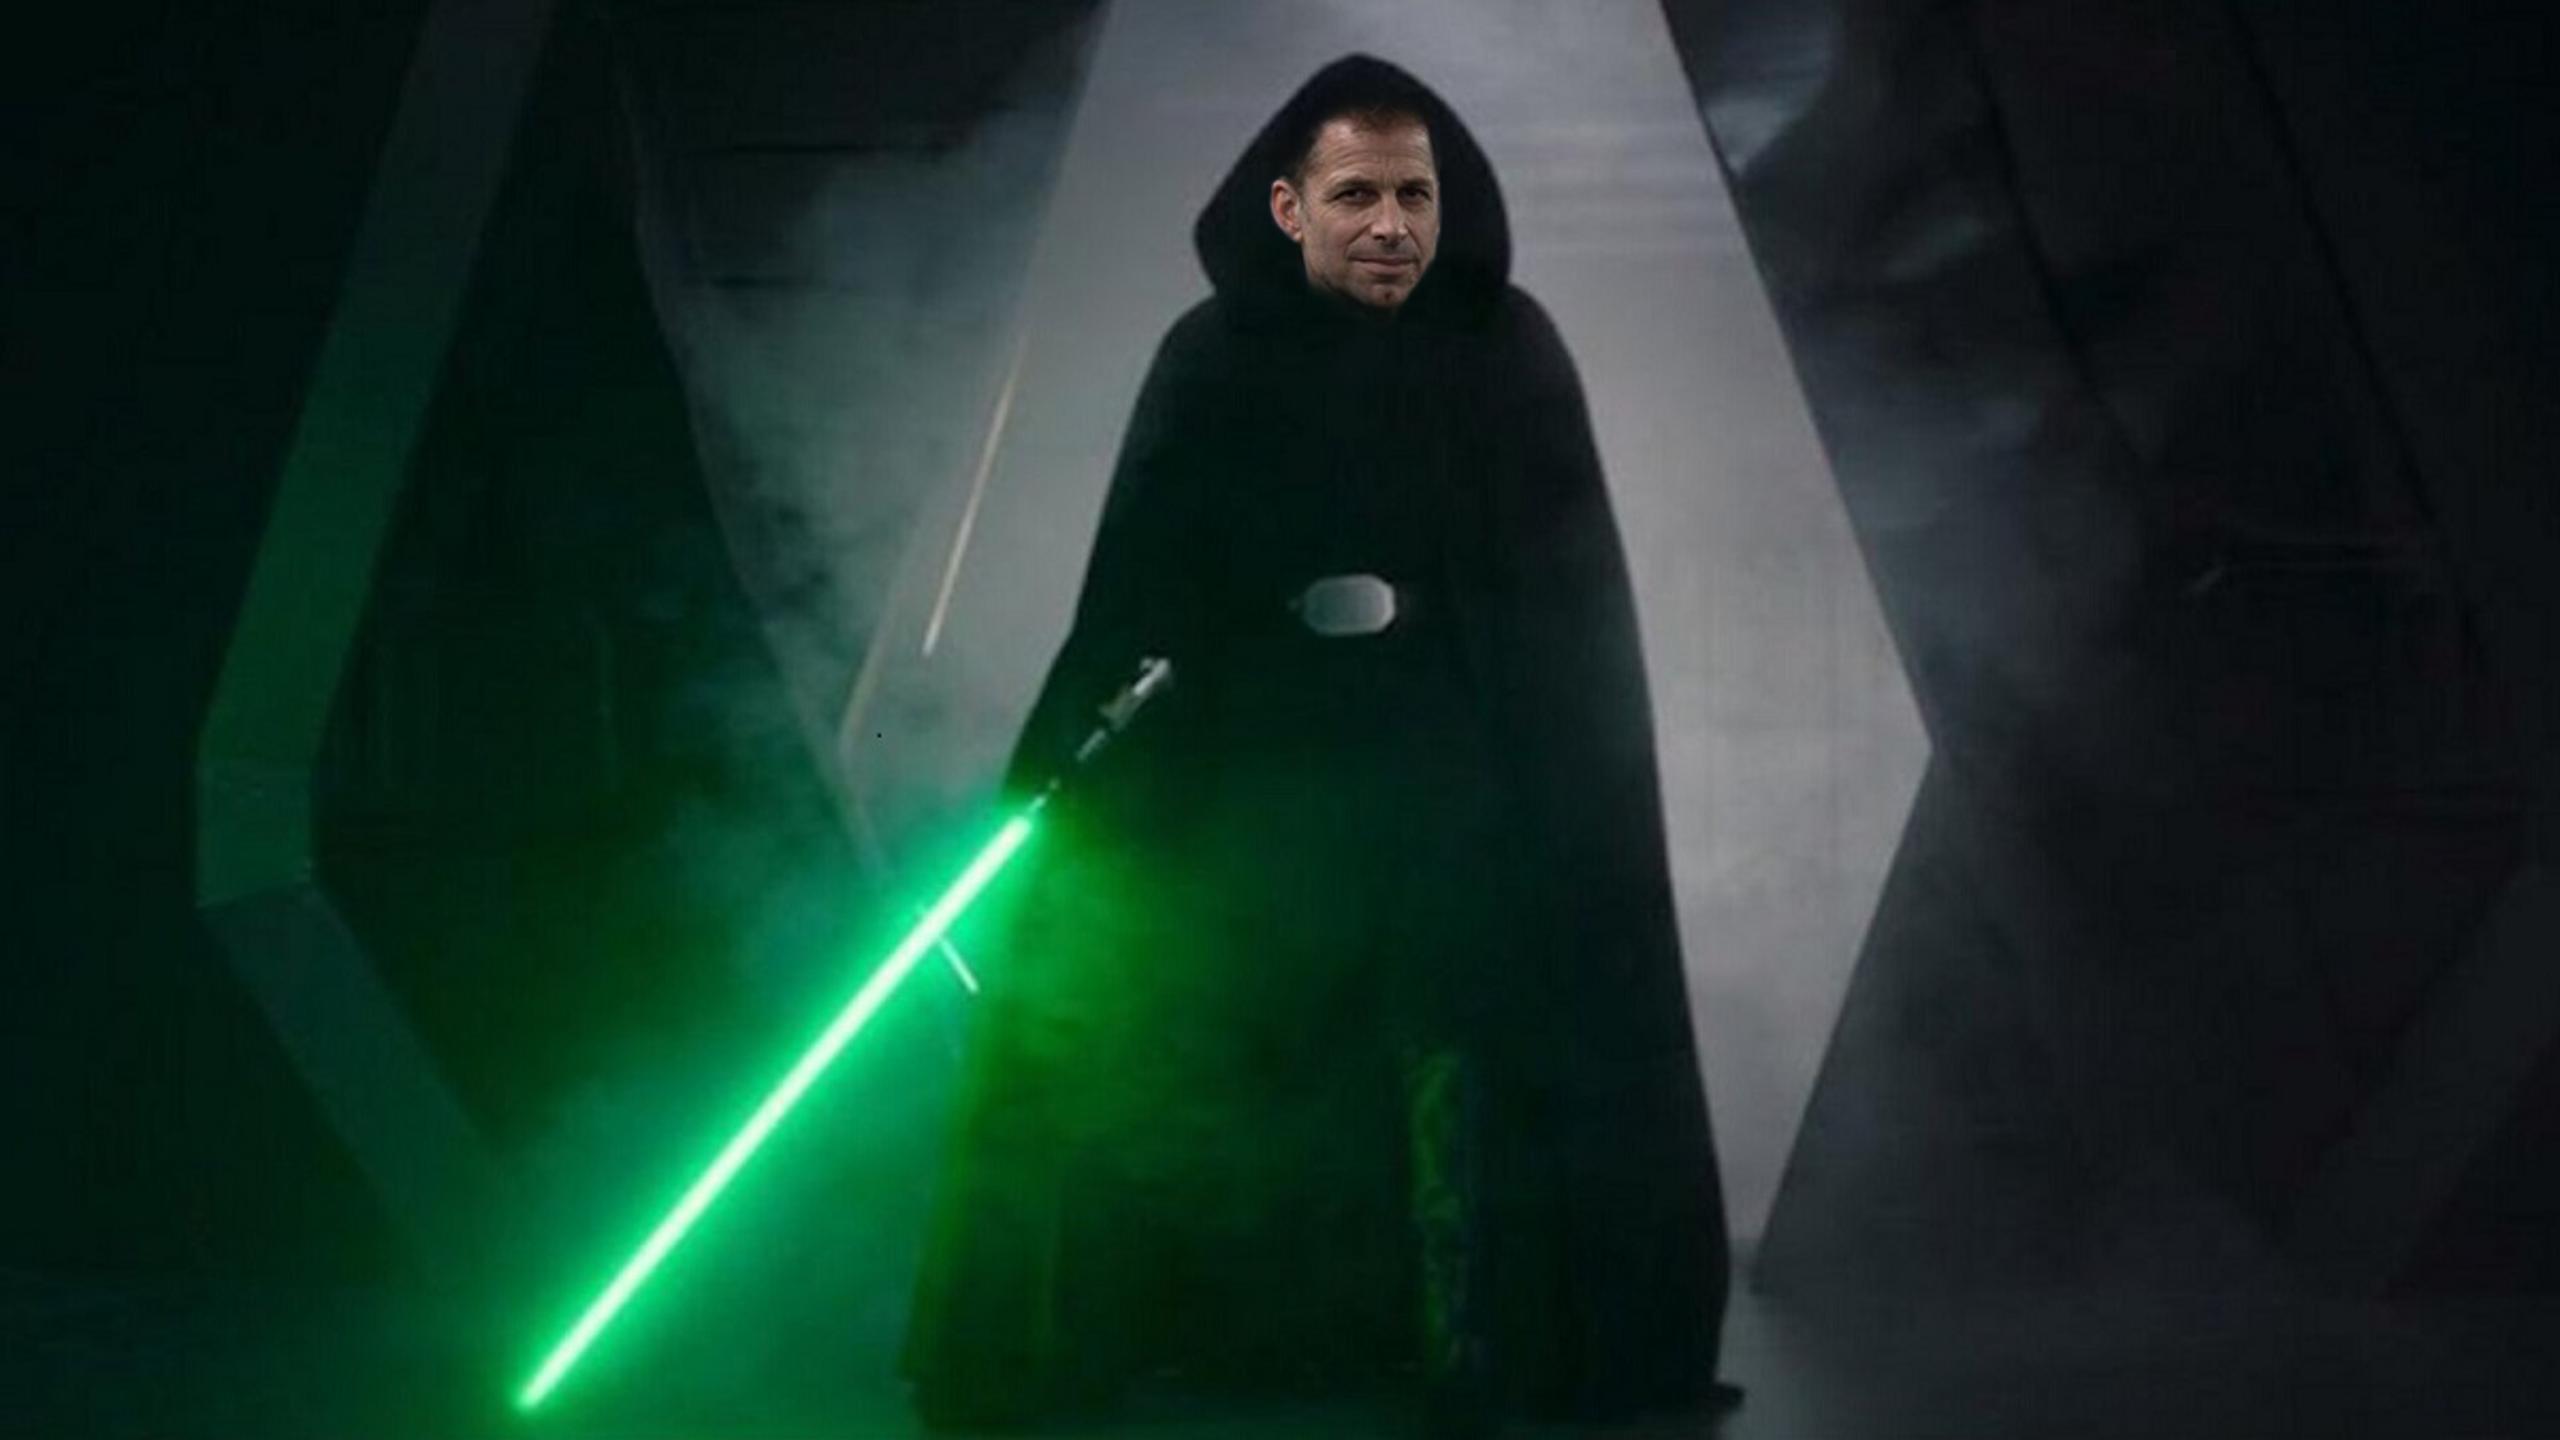 Jedi Zach Snyder